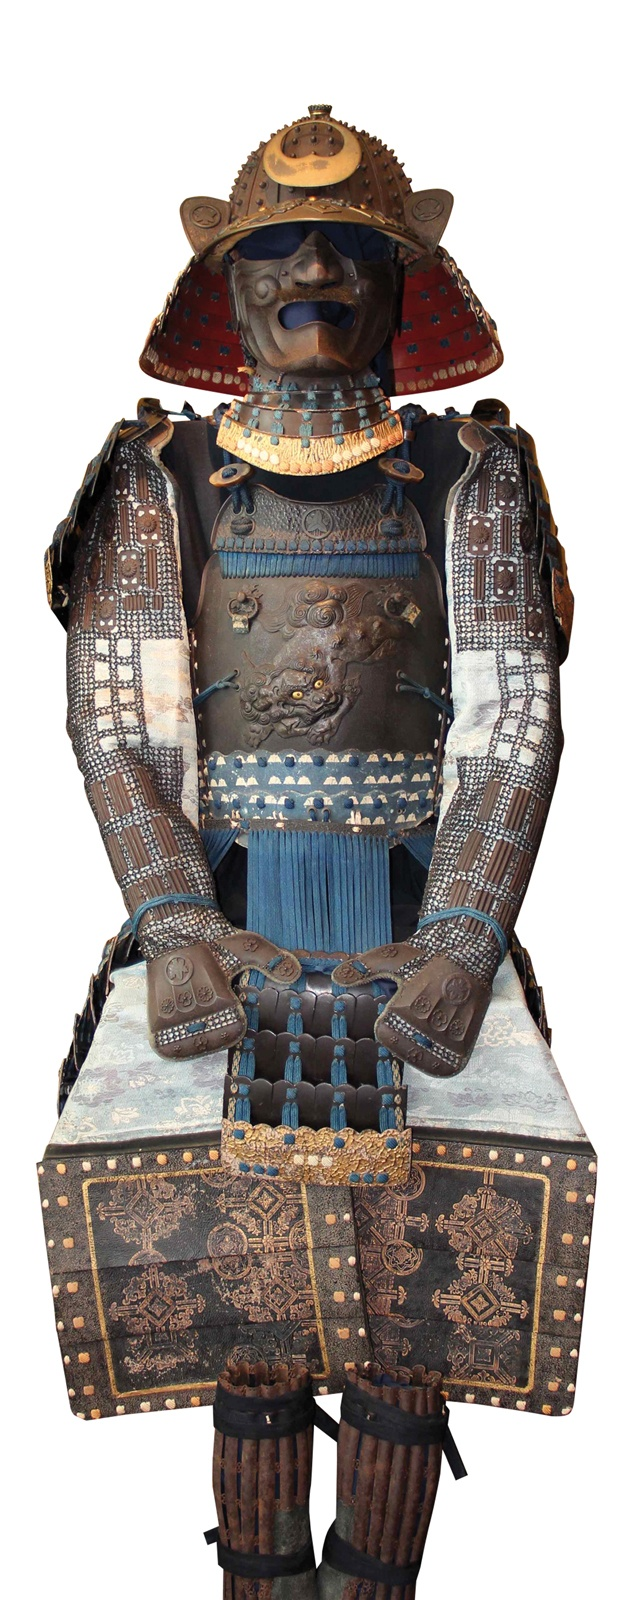 Armure samouraï.    Collection Richard Béliveau. Photo : © Alain Lefort